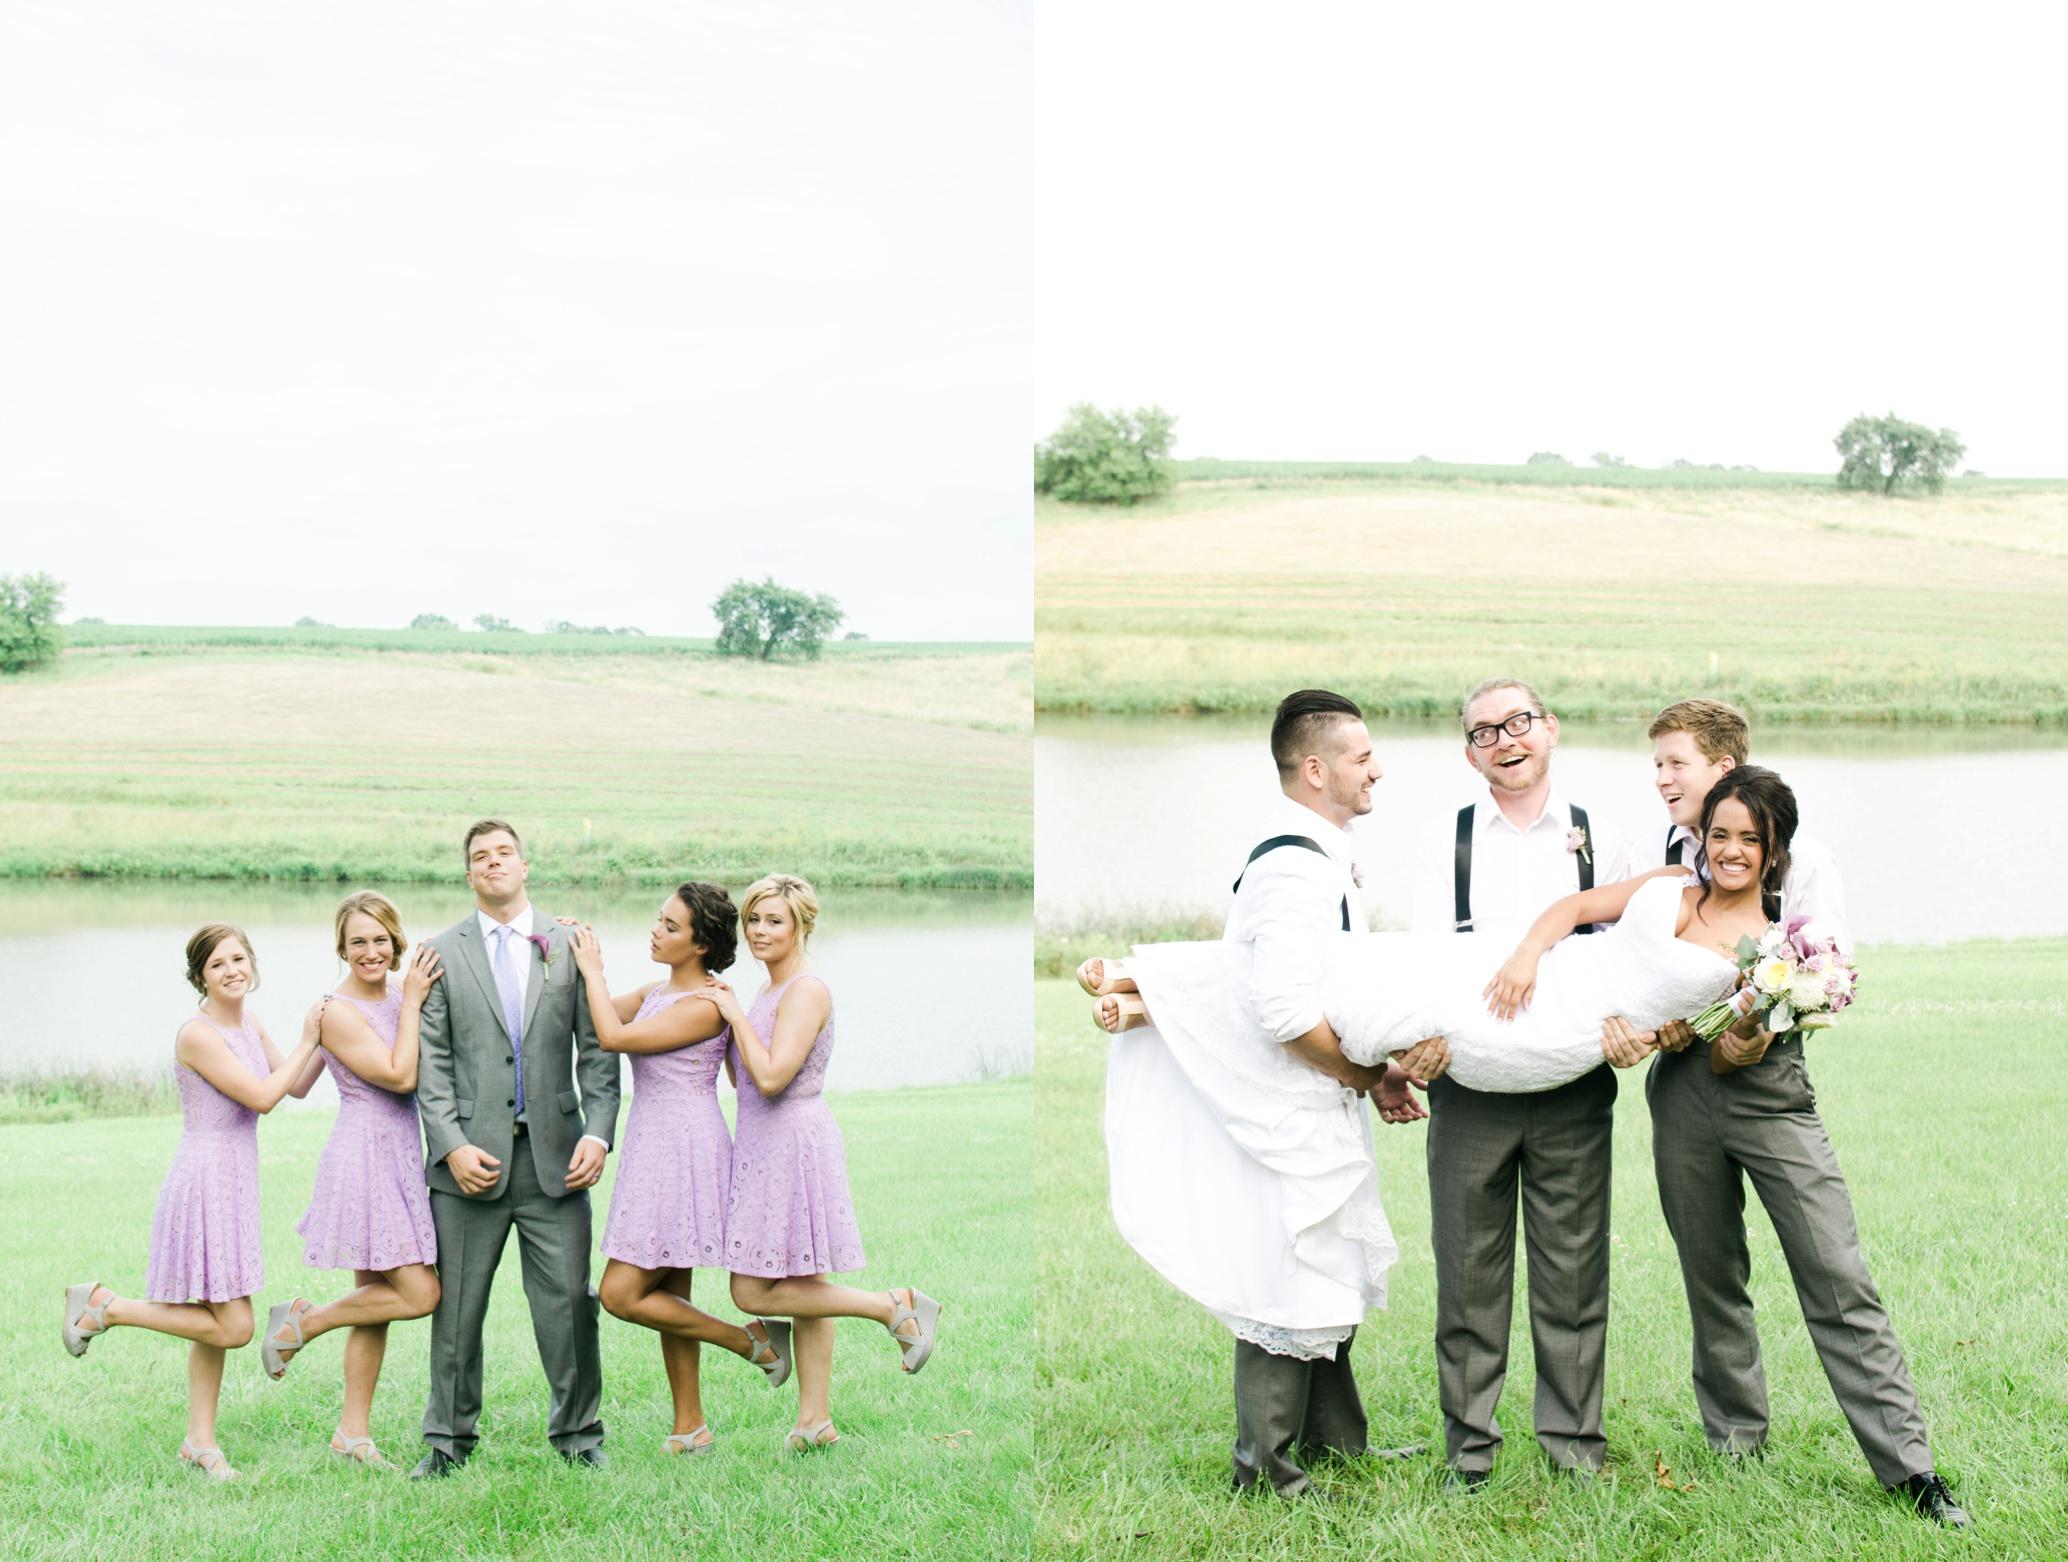 Barnes' Place Rustic Outdoor Wedding | Ali Leigh Photo Minneapolis Wedding Photographer_0146.jpg